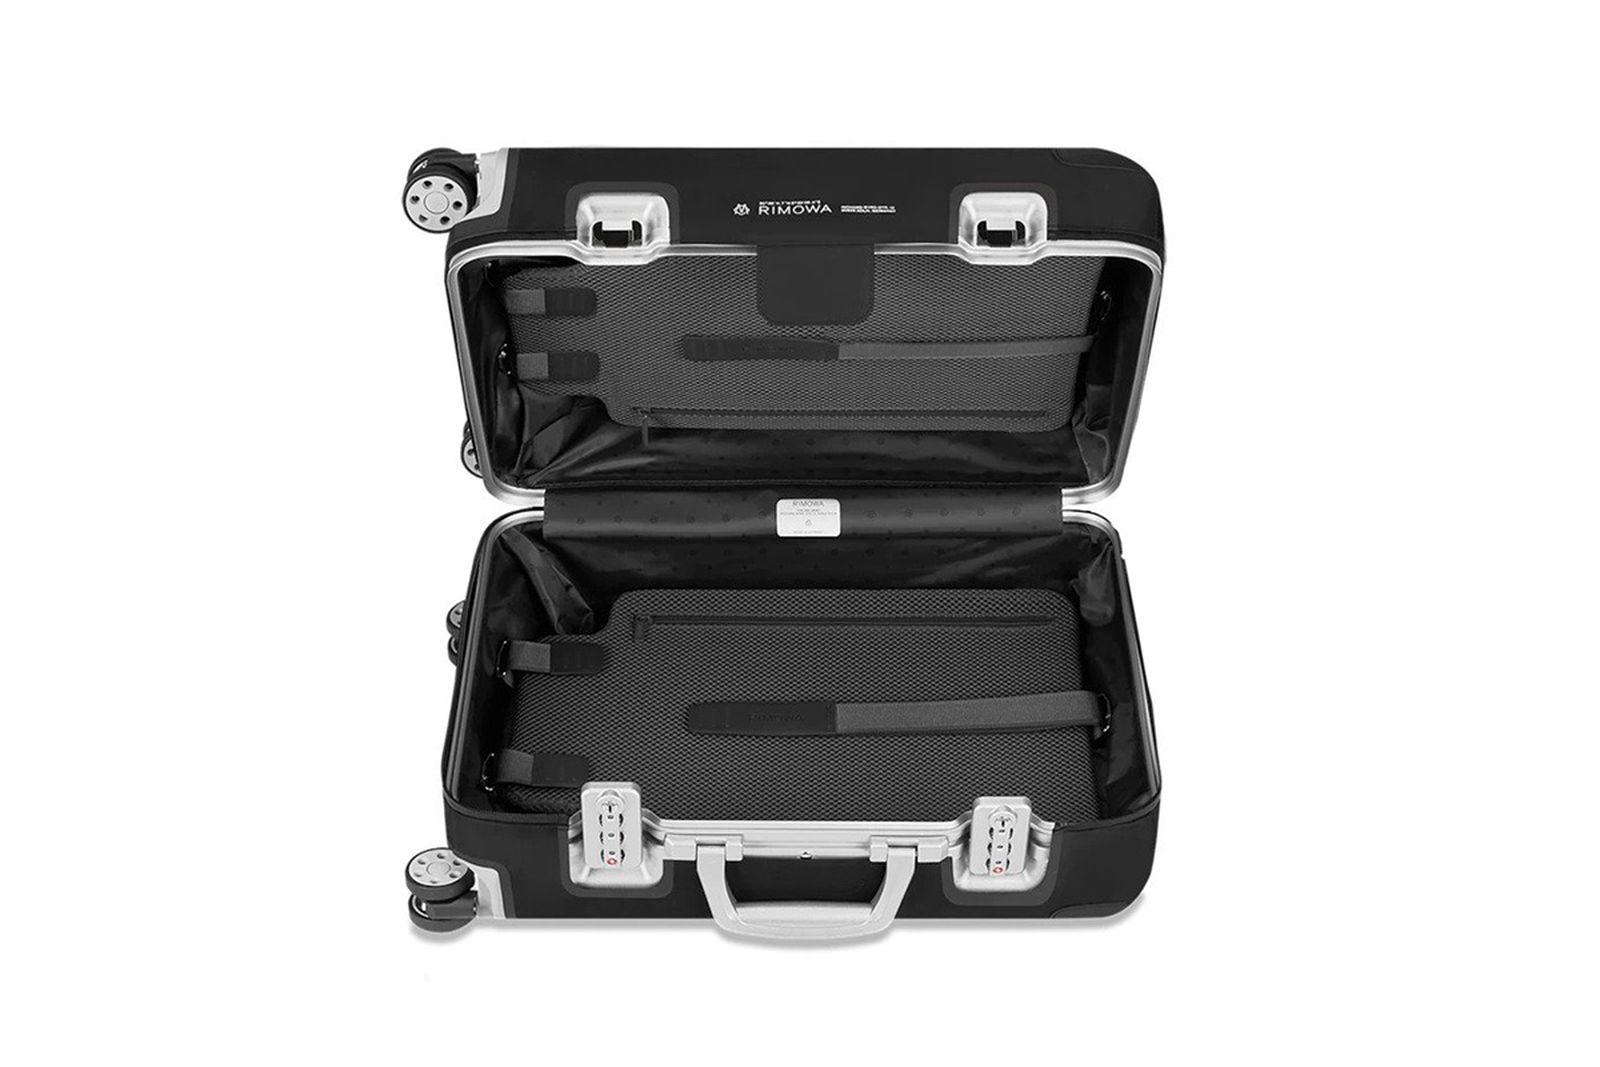 rimowa-luggage-suitcase-cover-02